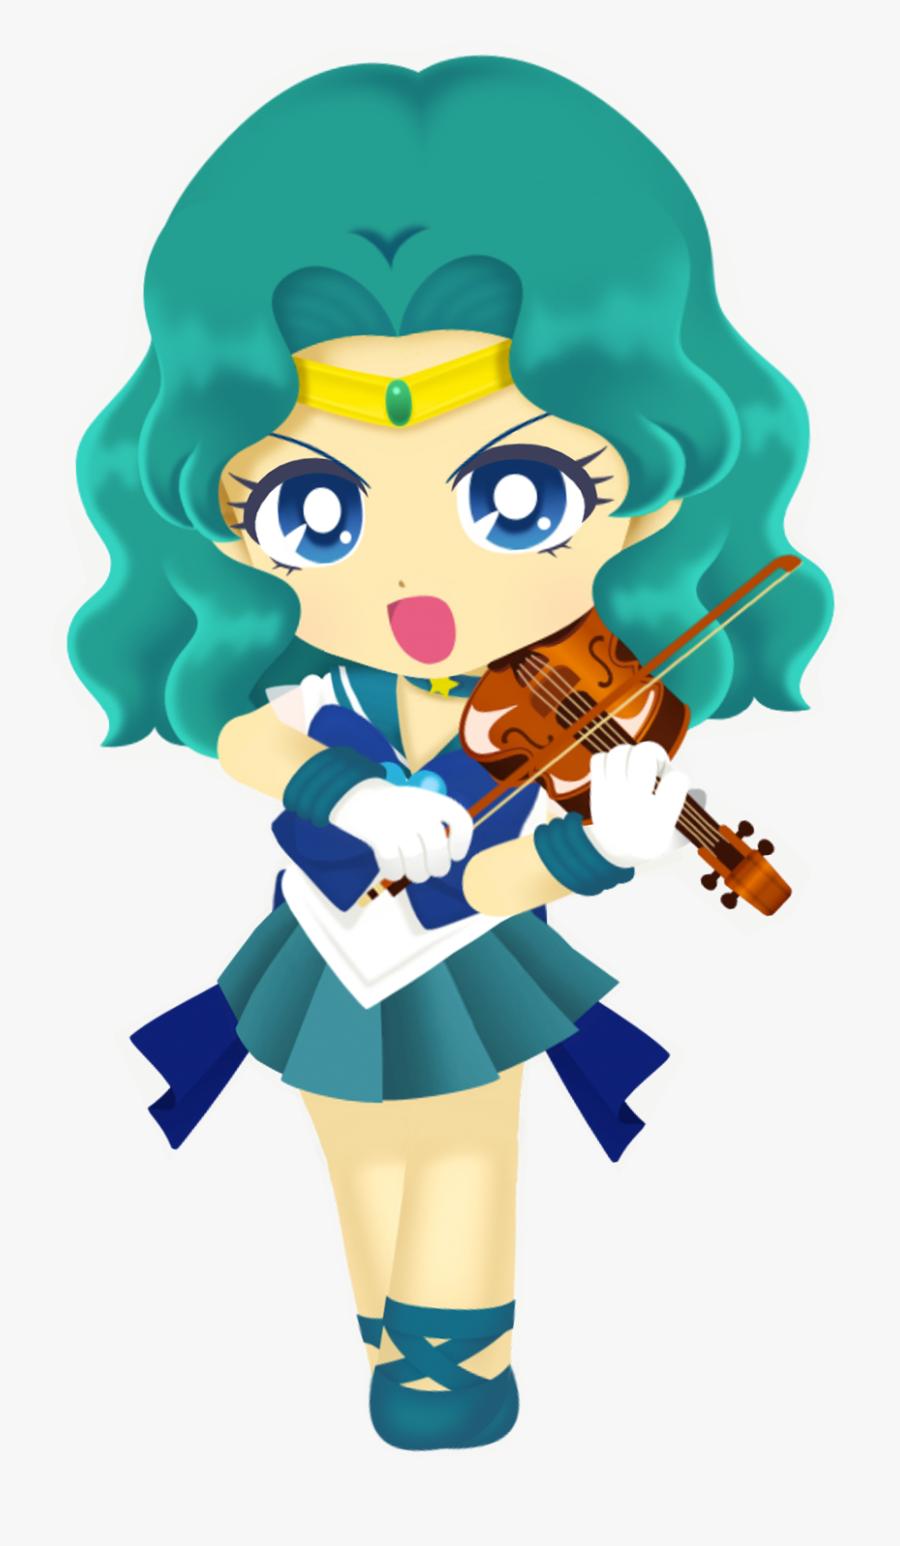 Transparent Sailor Neptune Png - Sailor Moon Drops Sailor Neptune, Transparent Clipart